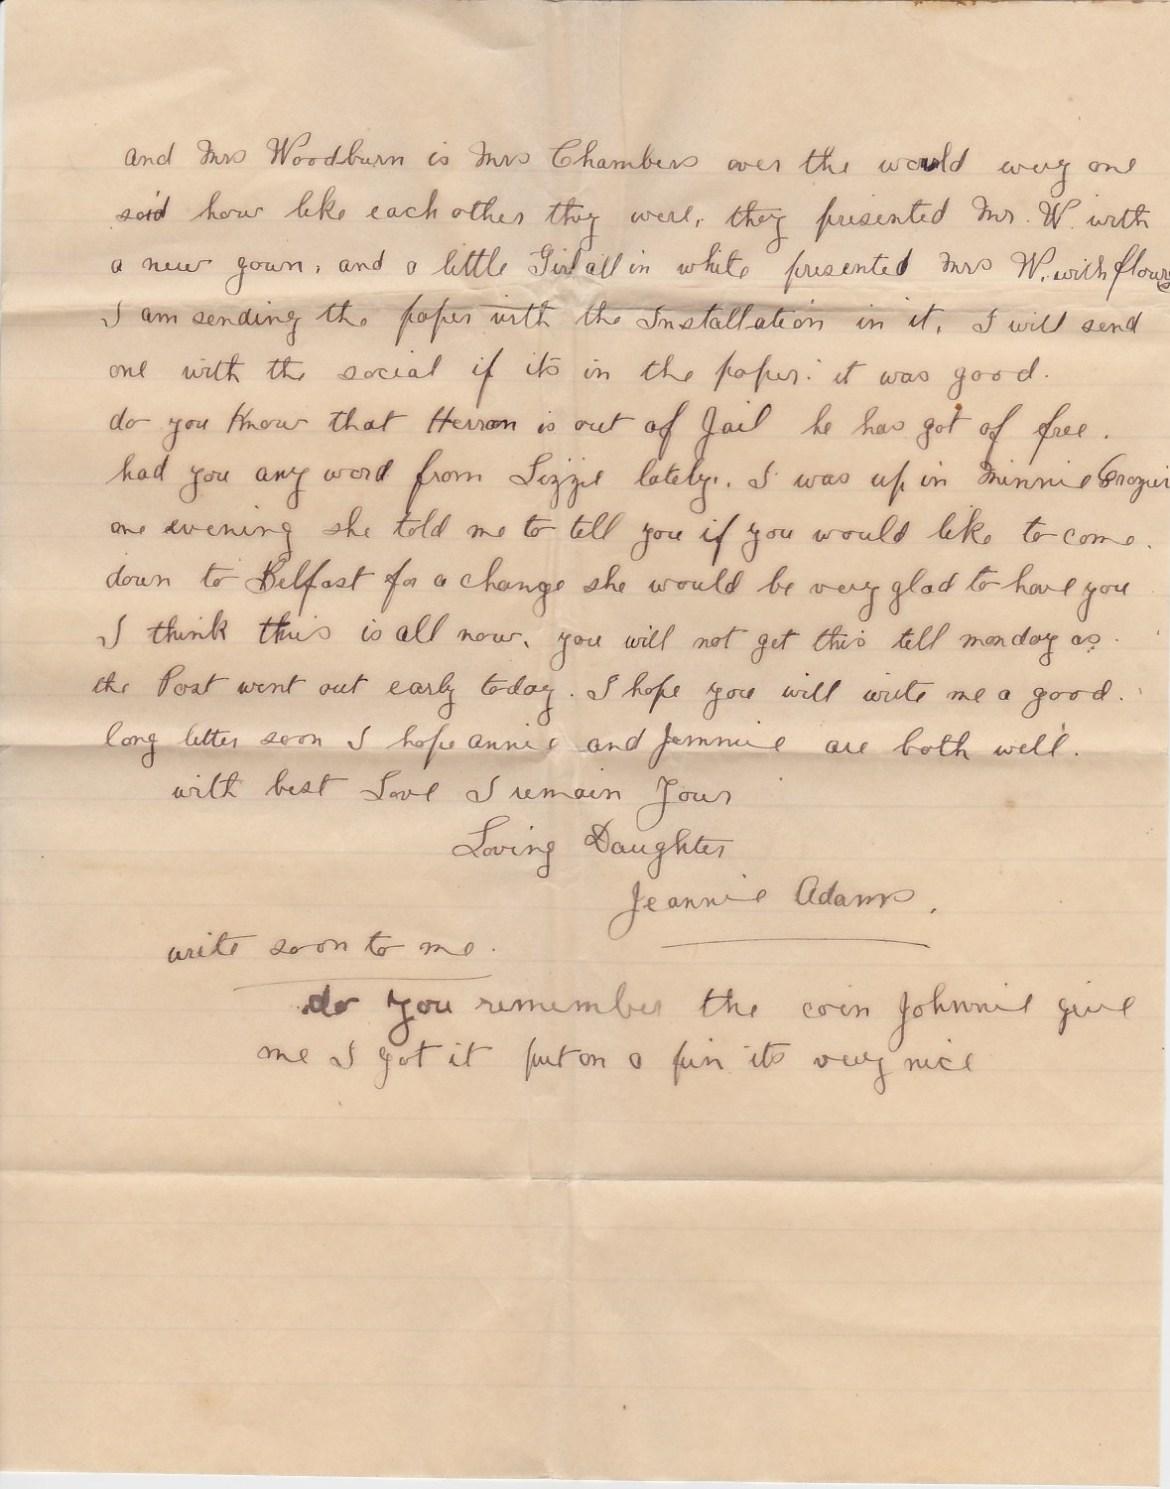 16 04 21 Jeannie Adams letter 21.04.16 b